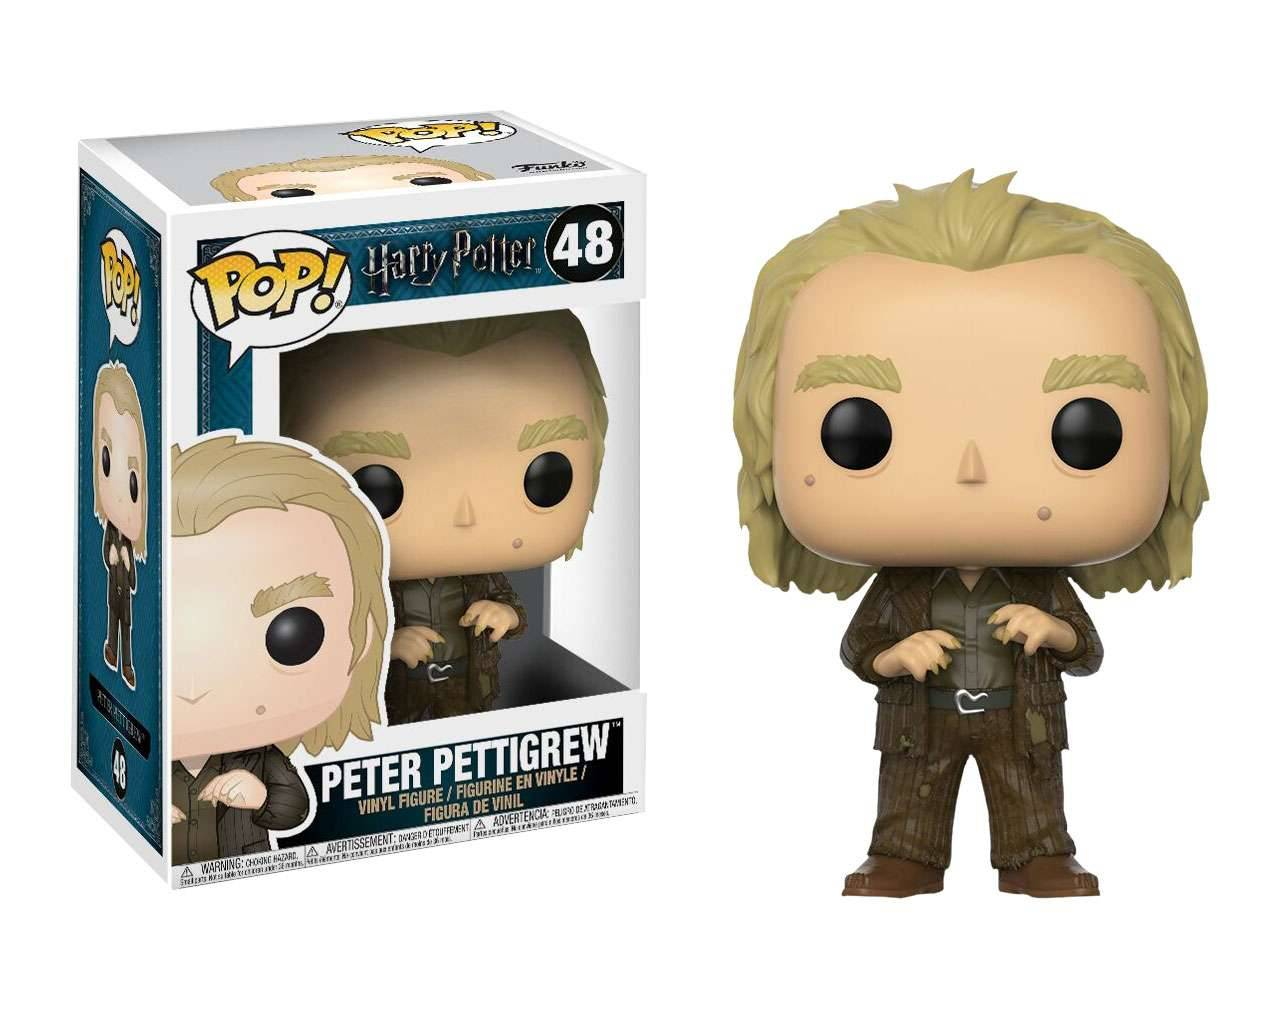 Peter Pettigrew Pop! Vinyl